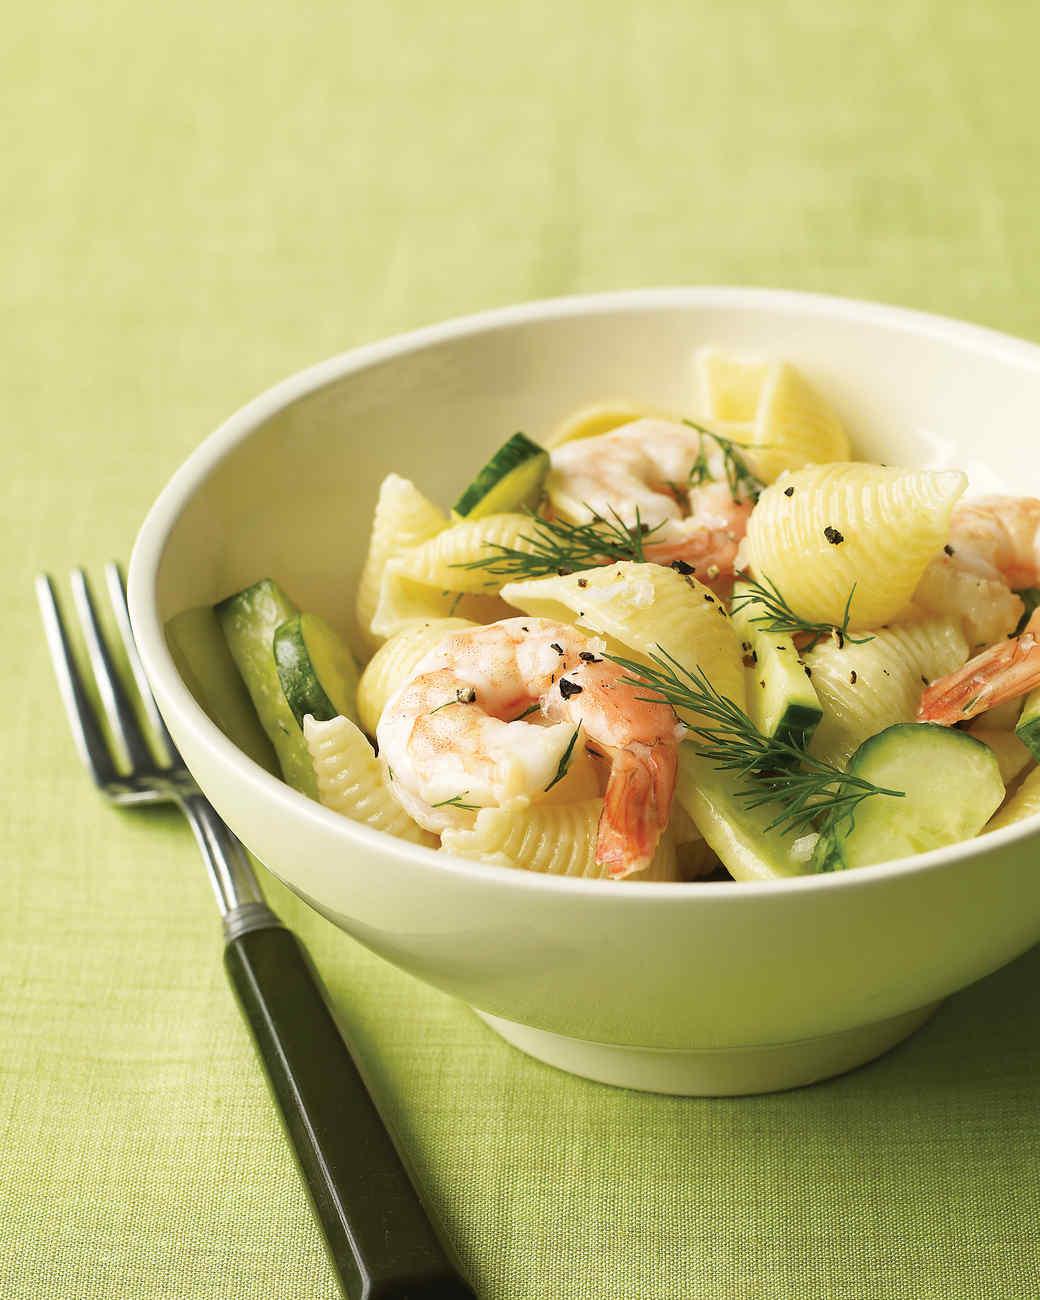 Shrimp dill pasta recipes